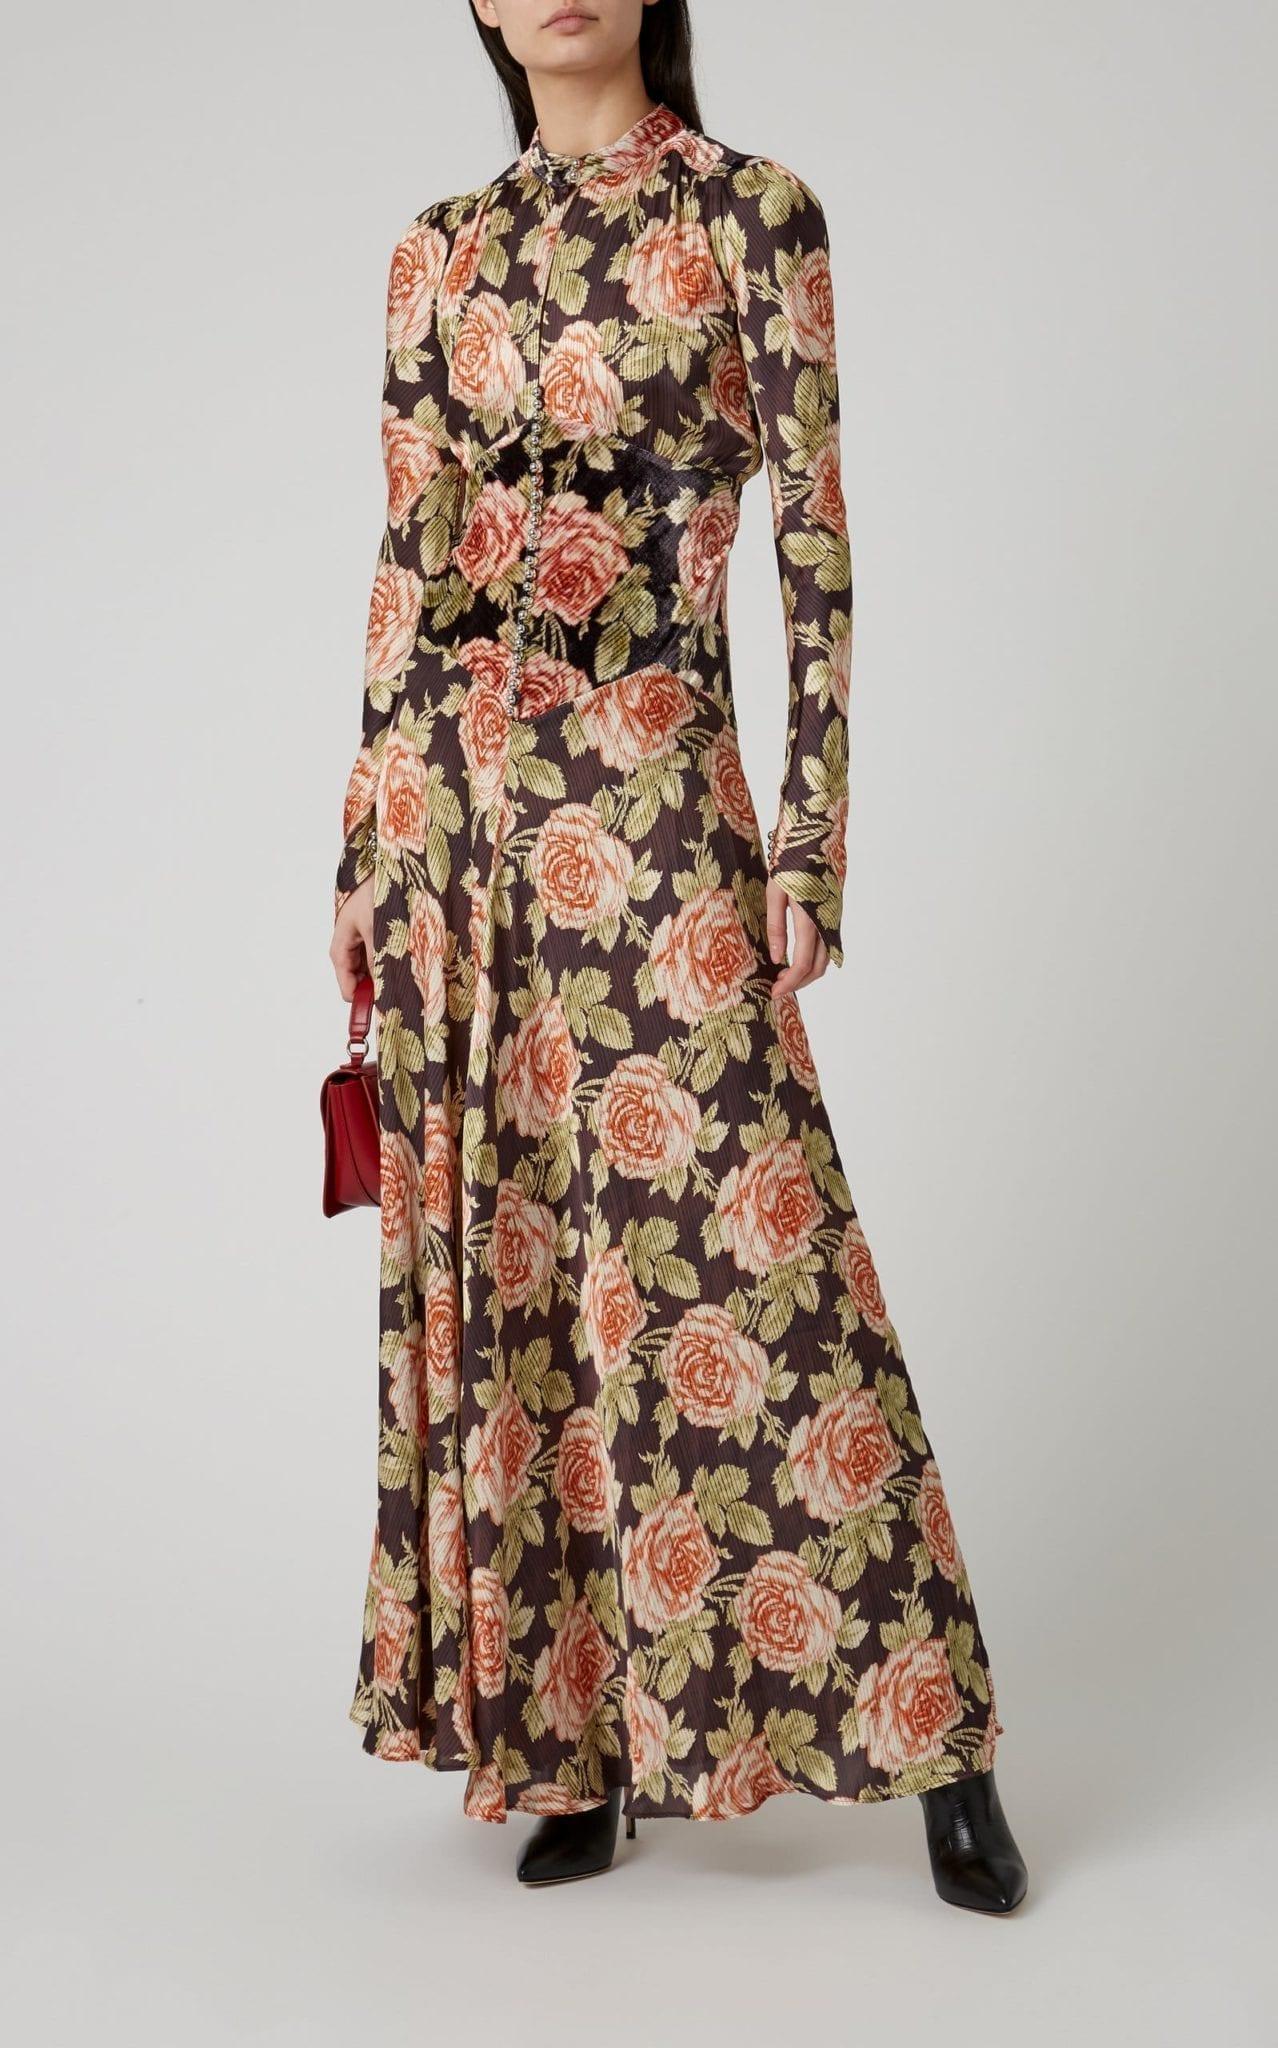 PACO RABANNE Floral-Print Gauze Maxi Dress